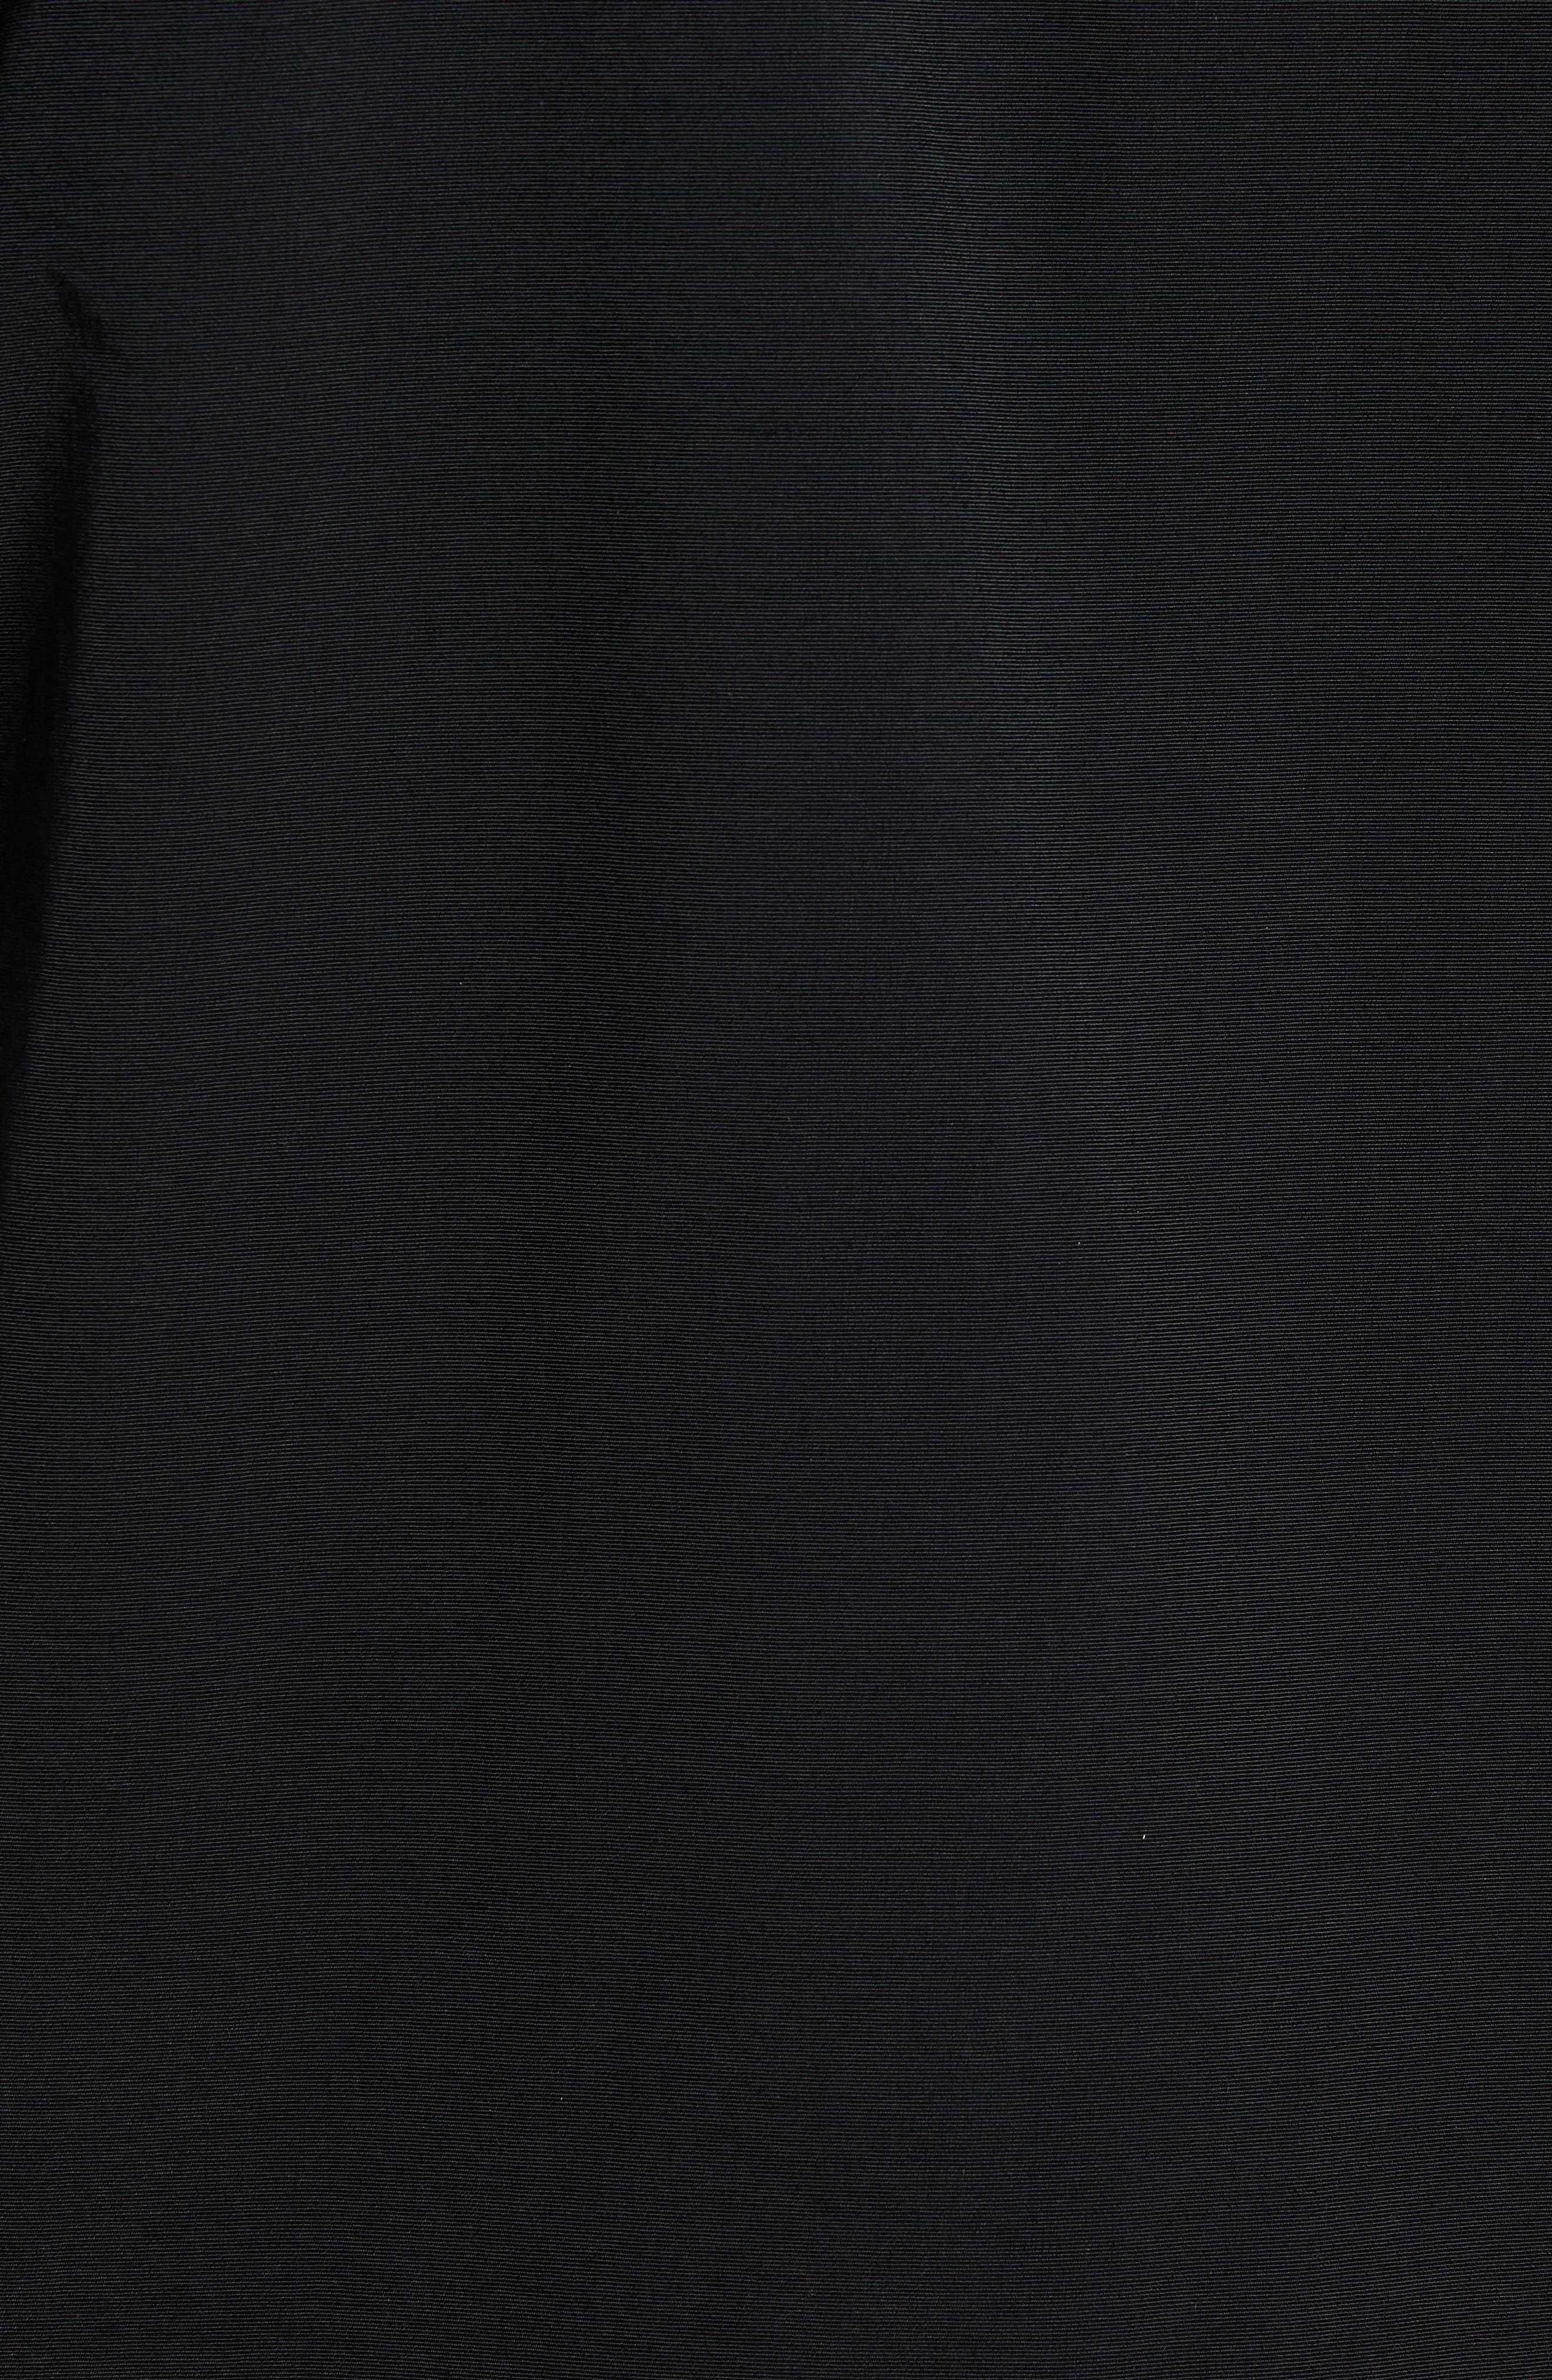 Goodstock Utility Jacket,                             Alternate thumbnail 7, color,                             BLACK